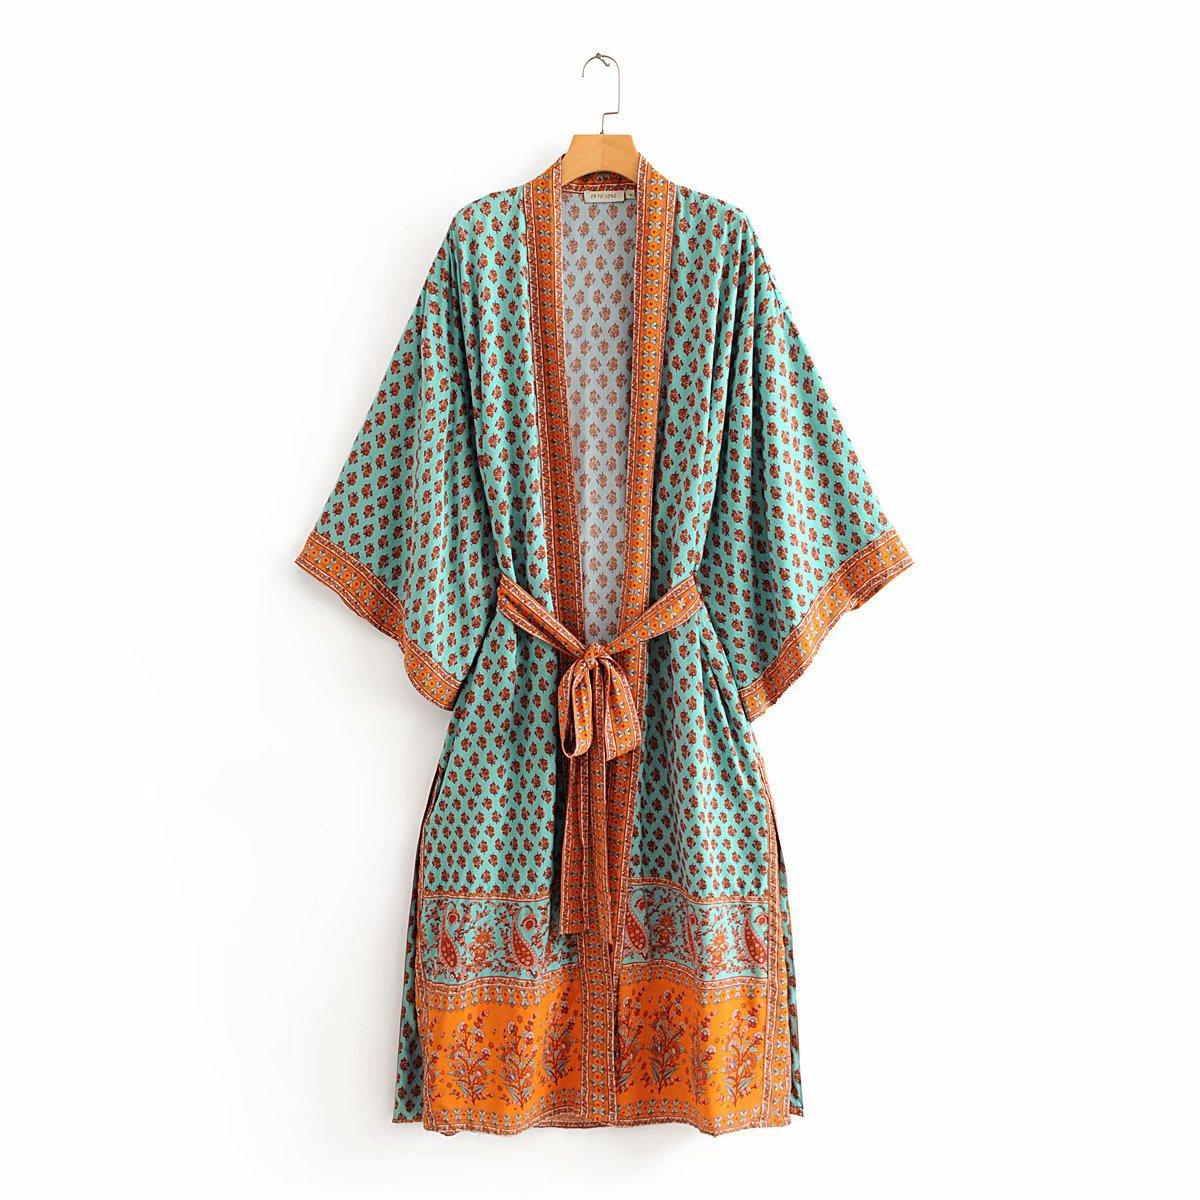 Robe dété 2020 vintage grande taille rose cajou Kimono zaraing femmes femmes châle Cardigan robe gainage vadiming Wdd60289